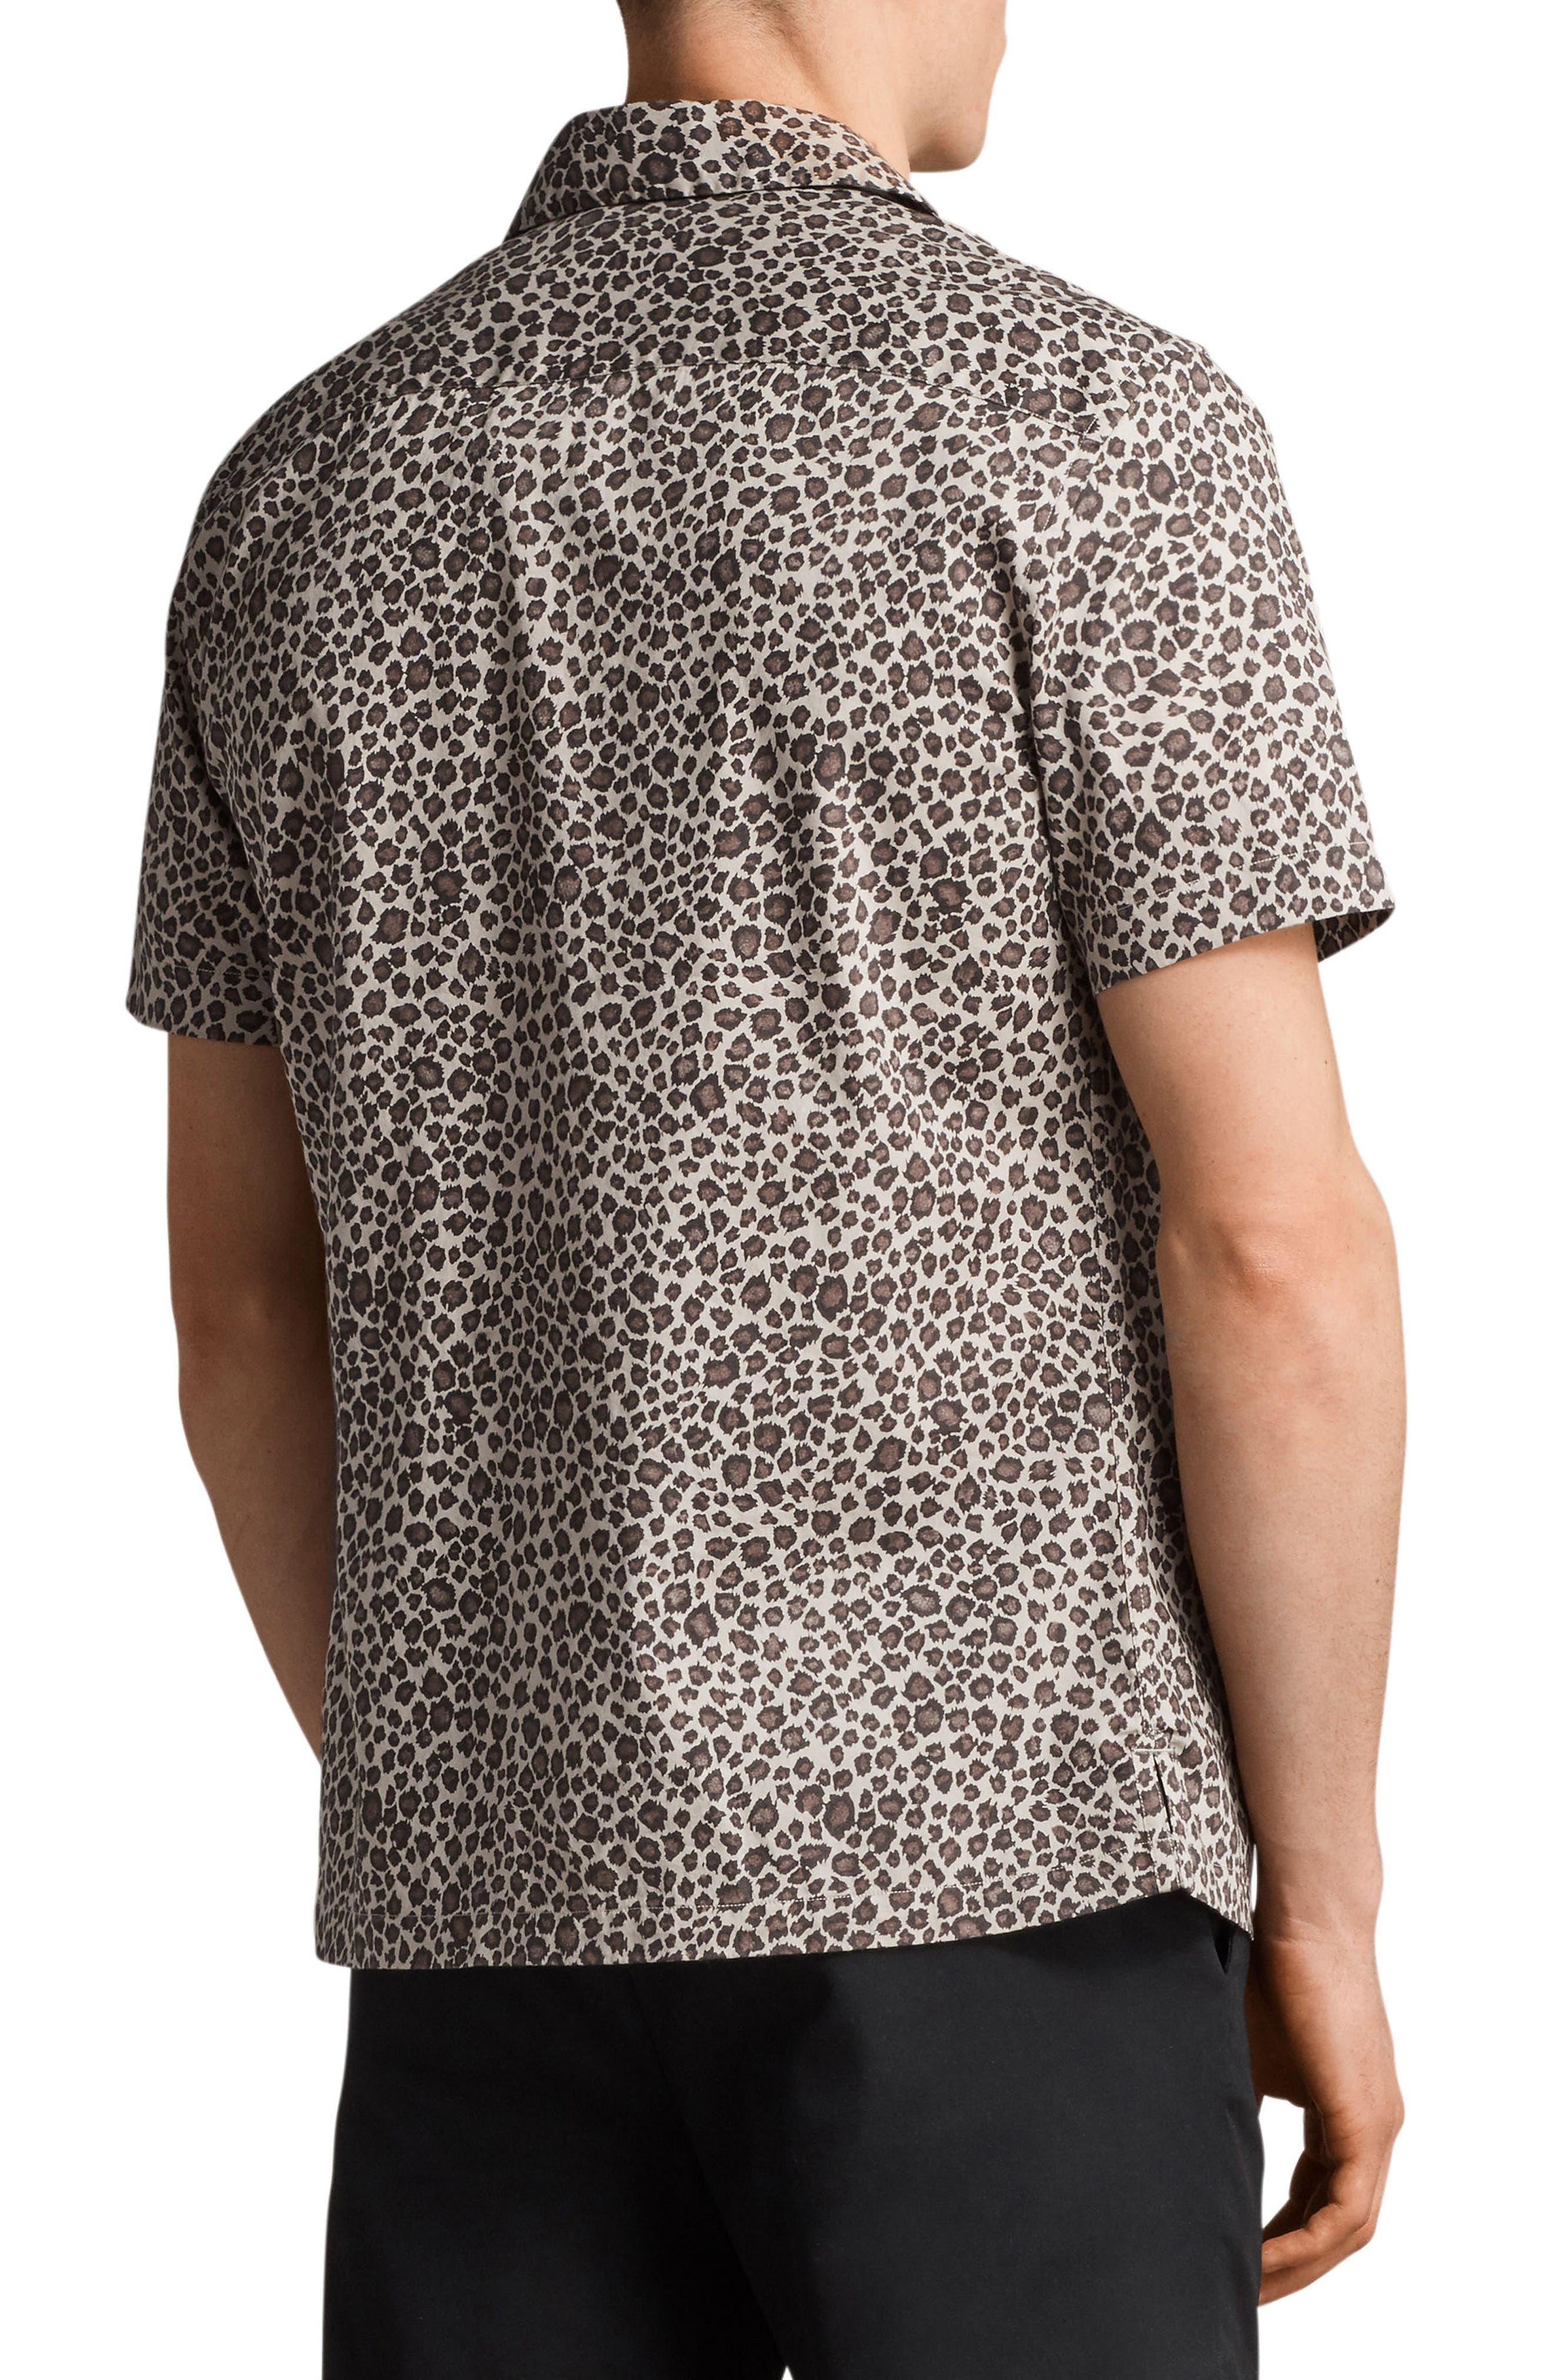 Apex Leopard Print Short Sleeve Sport Shirt,                             Alternate thumbnail 2, color,                             Light Brown